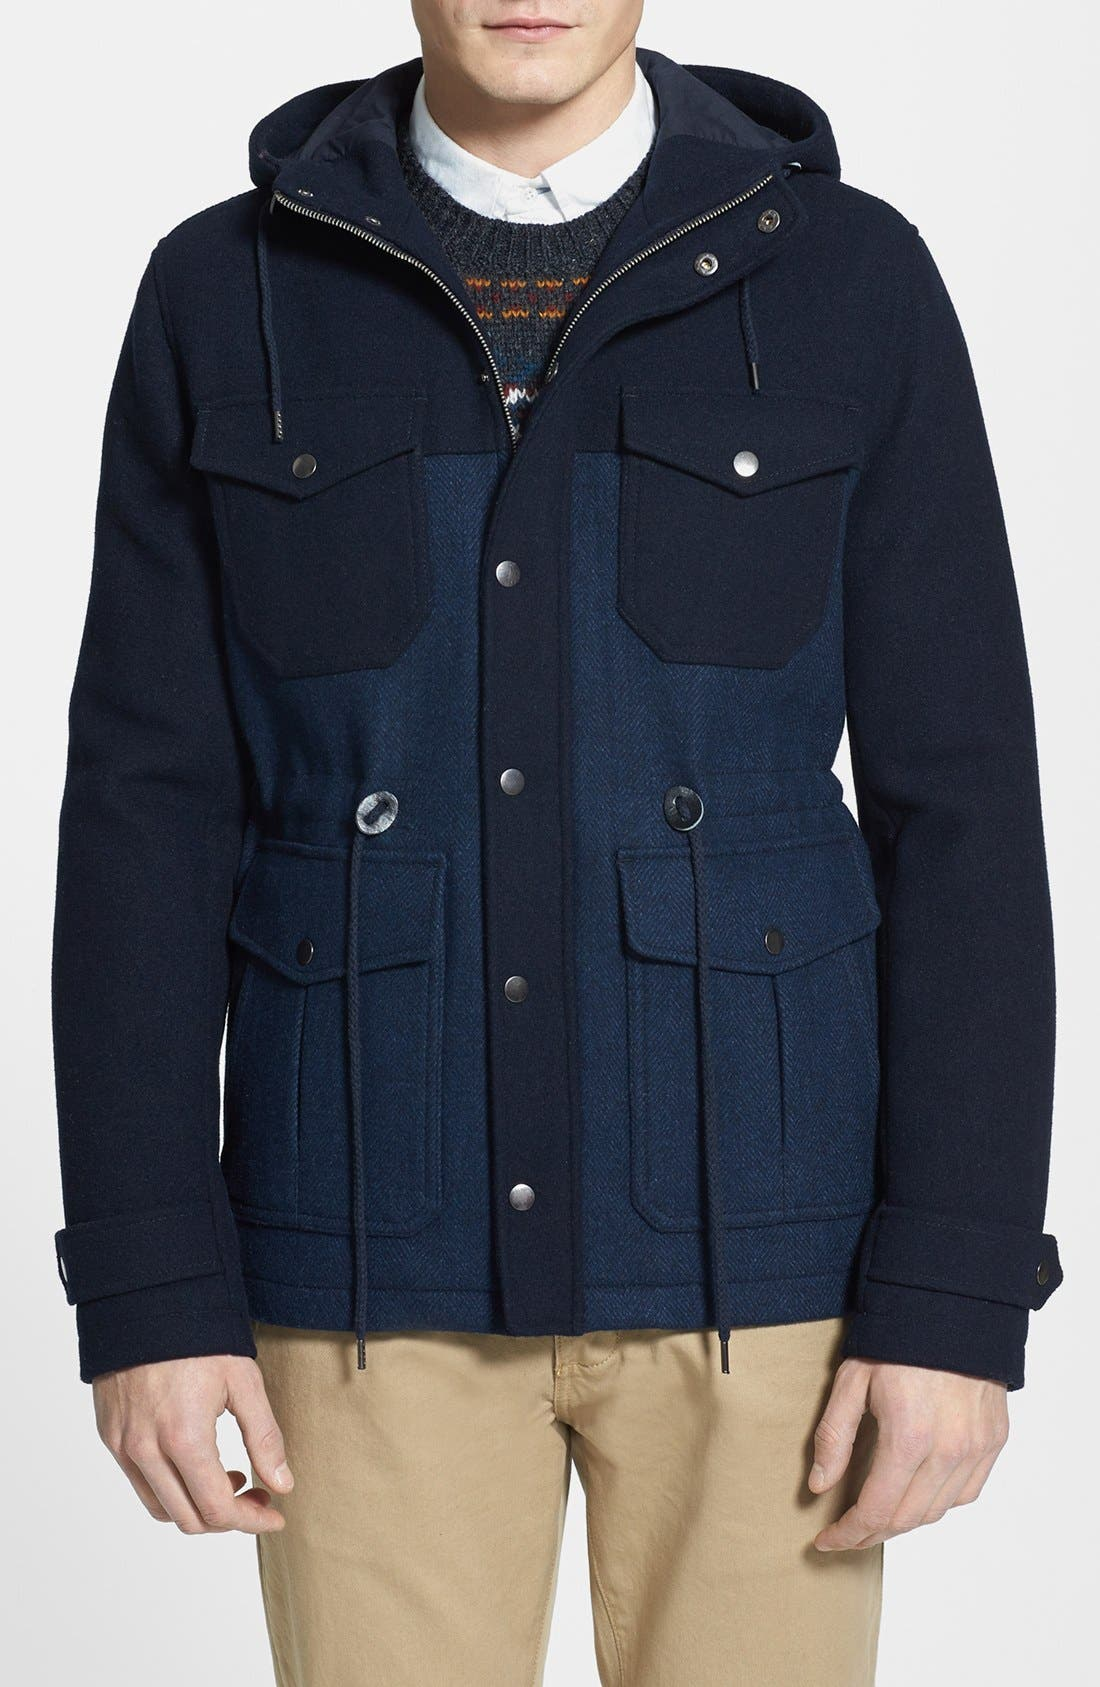 Alternate Image 1 Selected - Topman Two-Tone Wool Blend Field Jacket